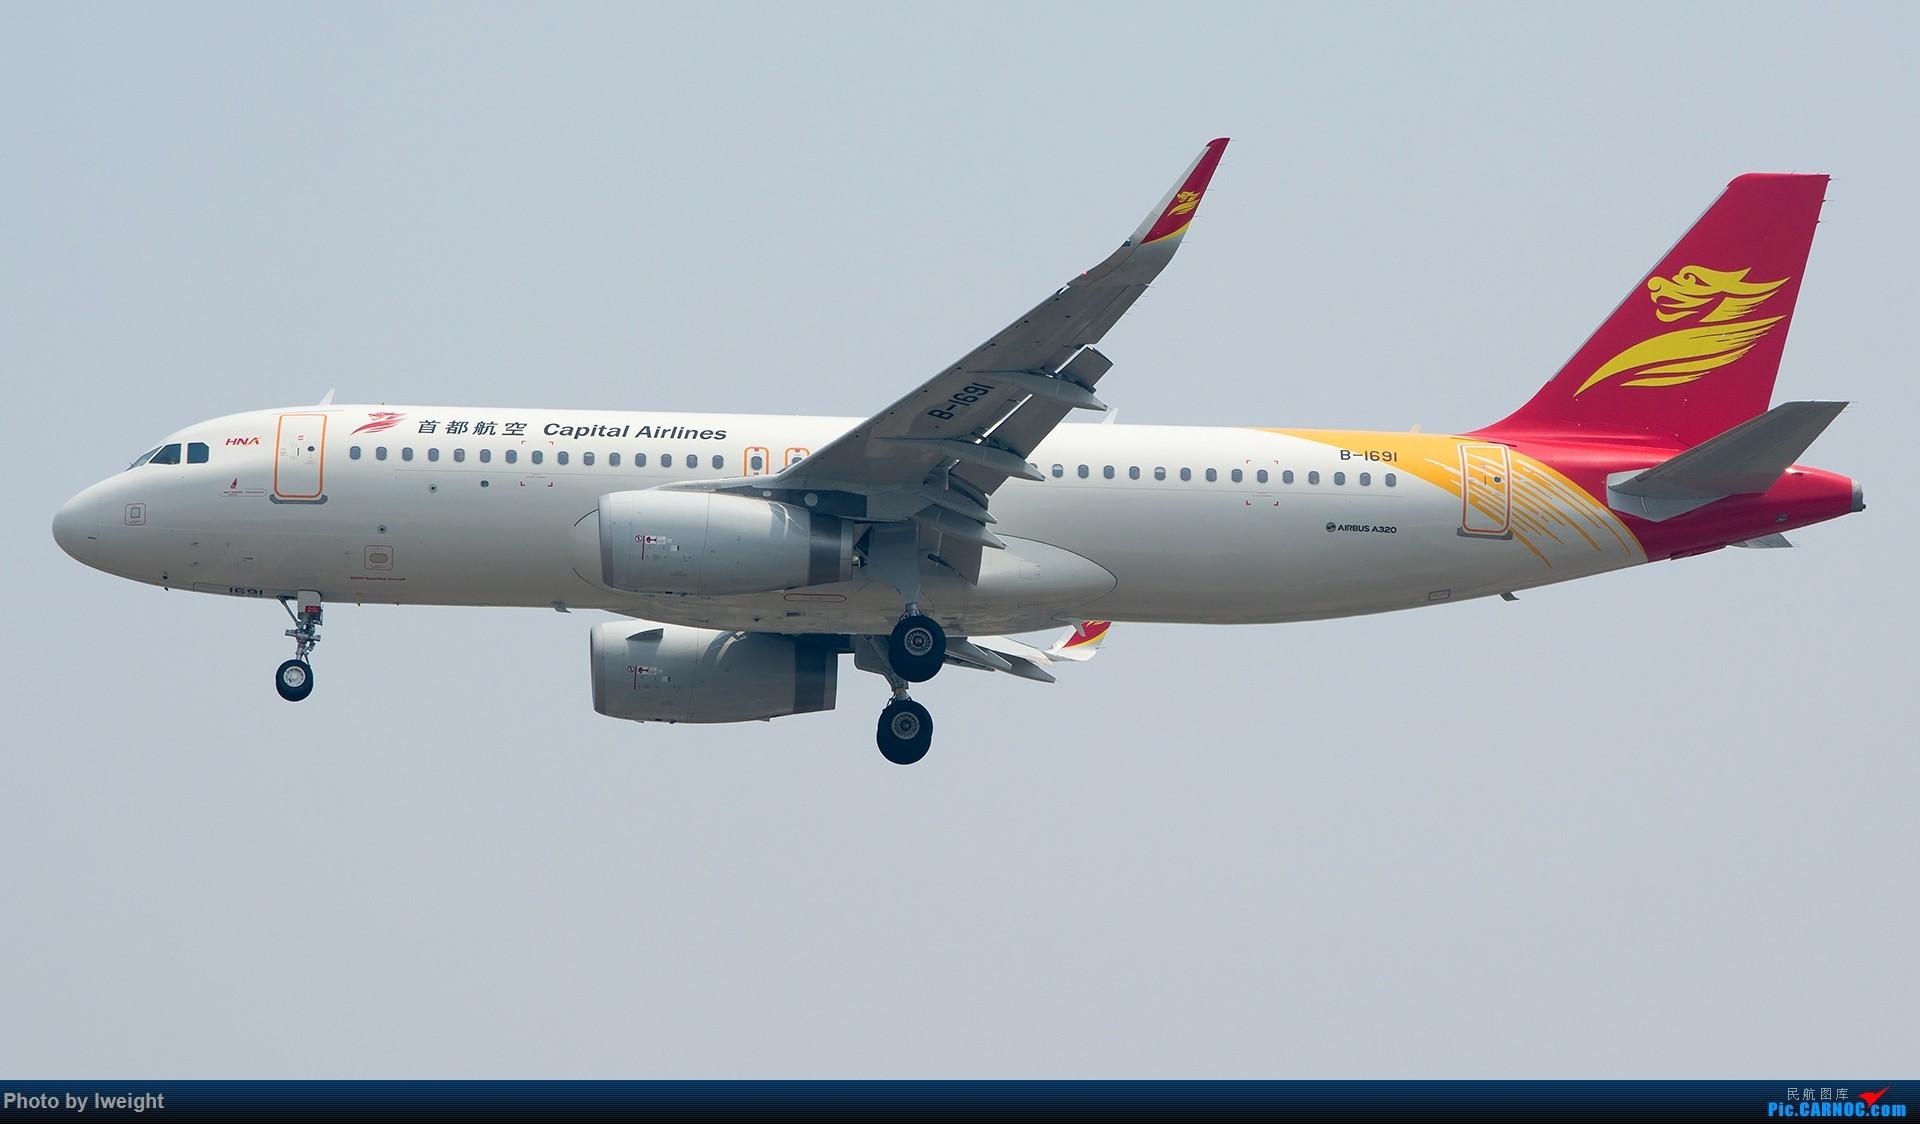 Re:[原创]周末帝都霾天拍机,凑合看看吧【2015-5-23】 AIRBUS A320-200 B-1691 中国北京首都国际机场